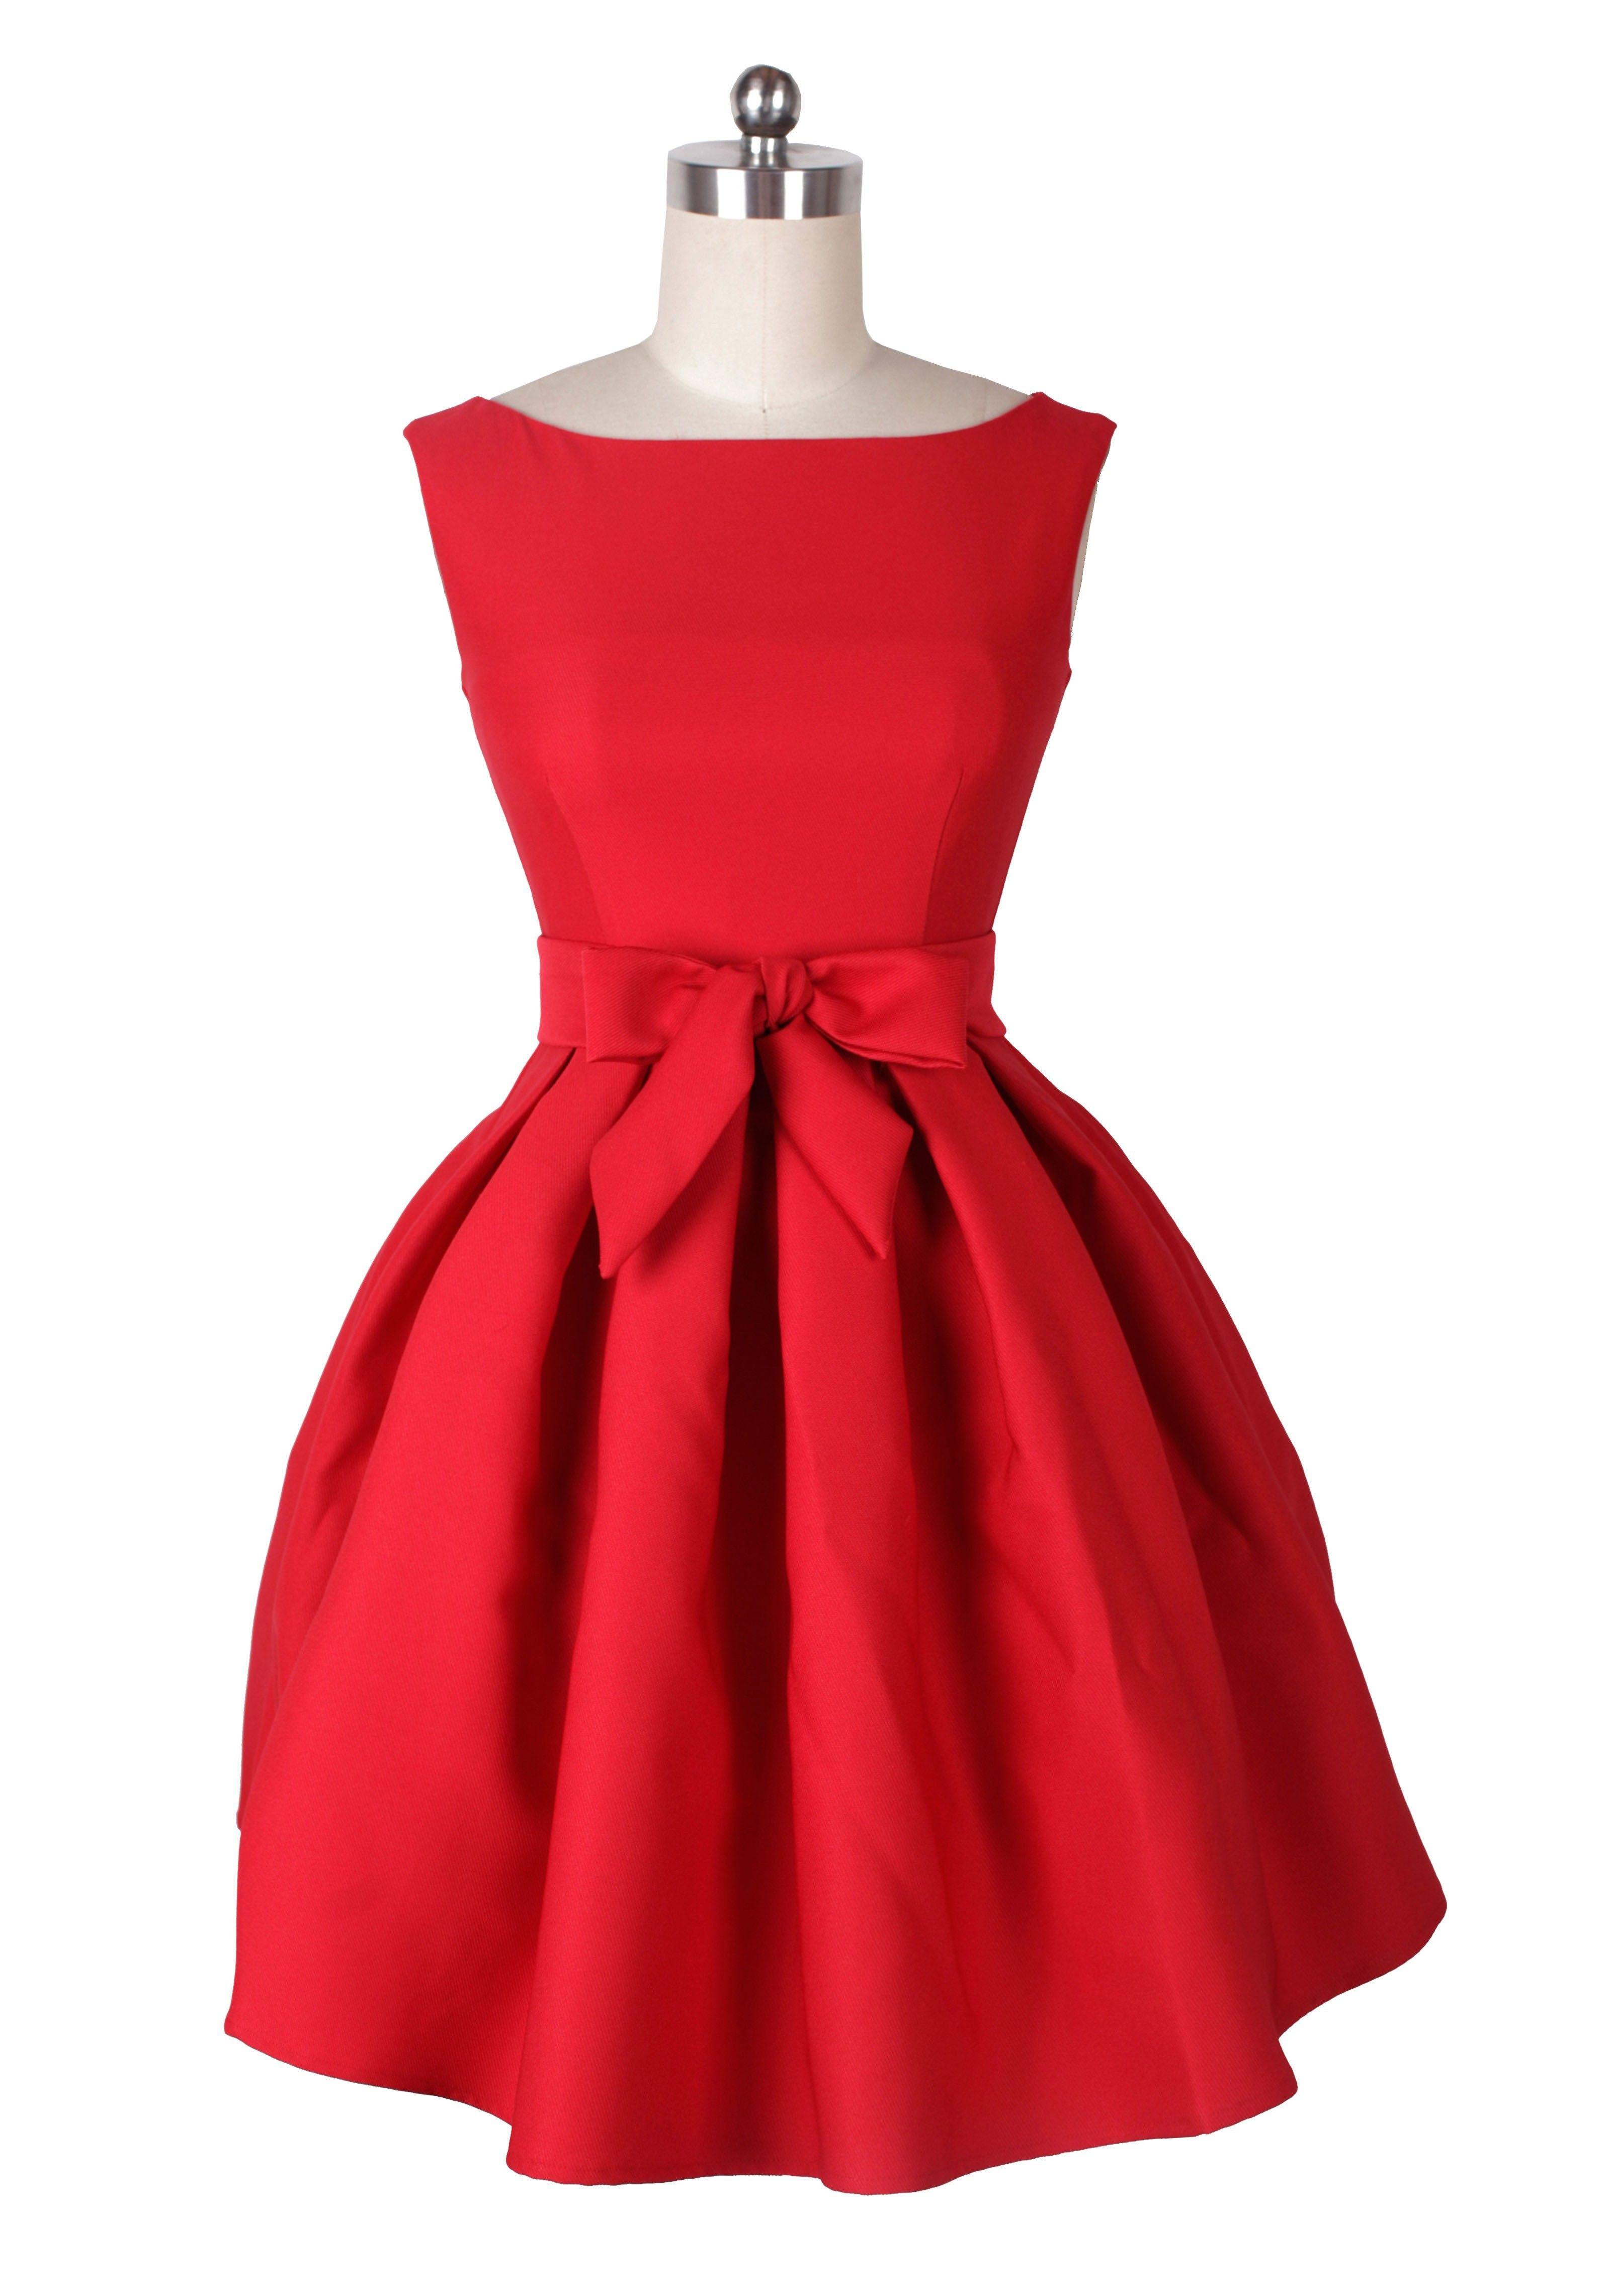 ad0a3468880244 ReoRia Modern-Day Audrey Hepburn Red Party Wedding Dress  1950s   vintagedress